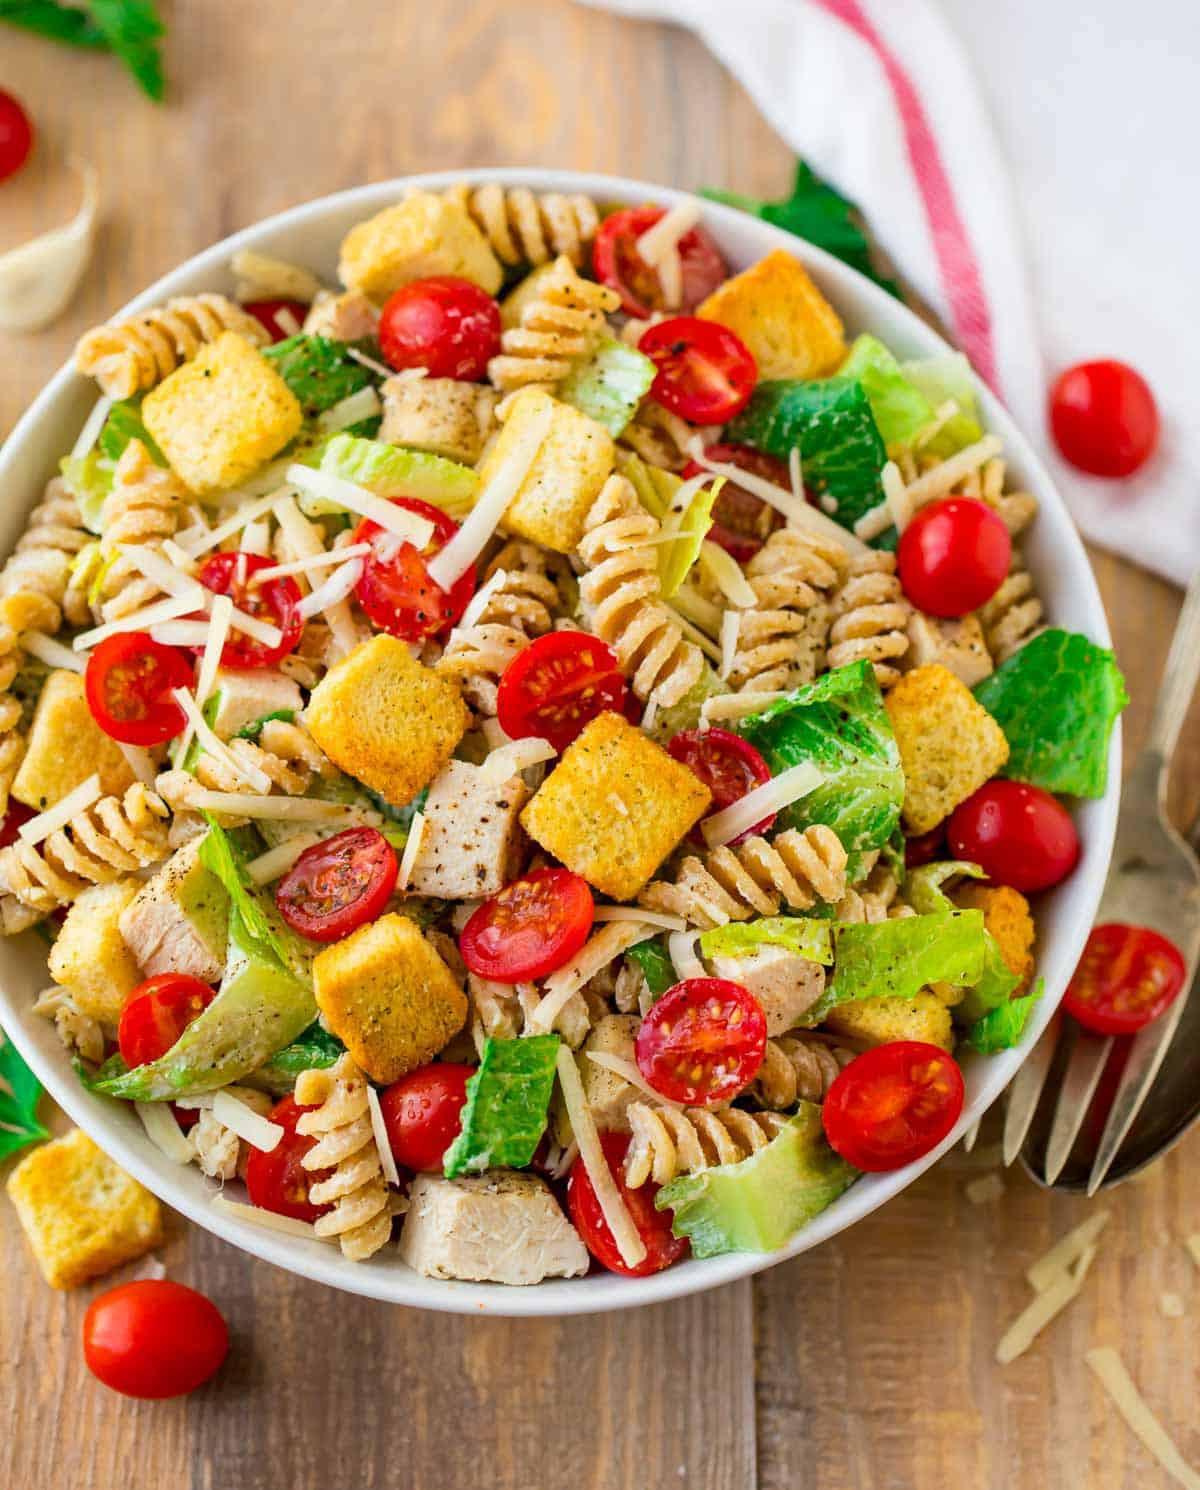 Healthy Chicken Pasta Salad  Chicken Caesar Pasta Salad